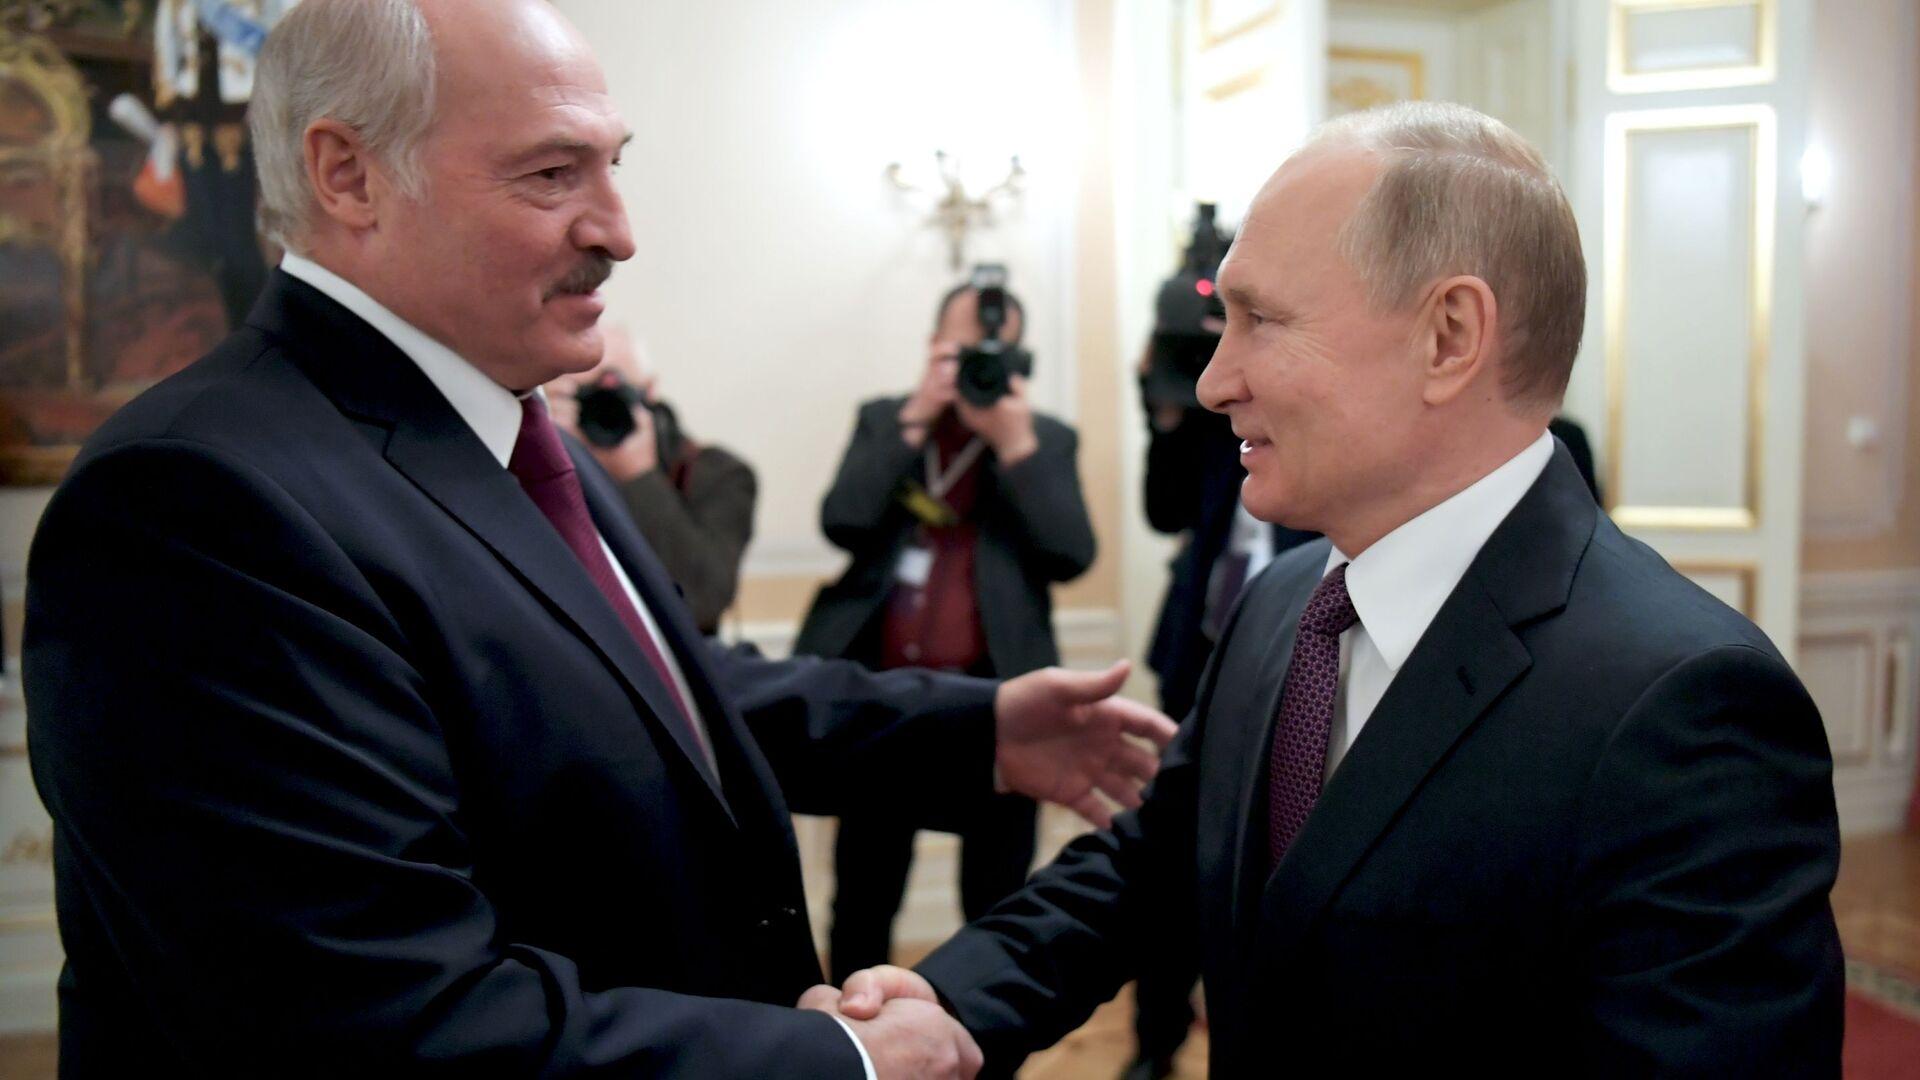 Prezydent Białorusi  Alaksandr Łukaszenka i prezydent Rosji Władimir Putin - Sputnik Polska, 1920, 25.09.2021